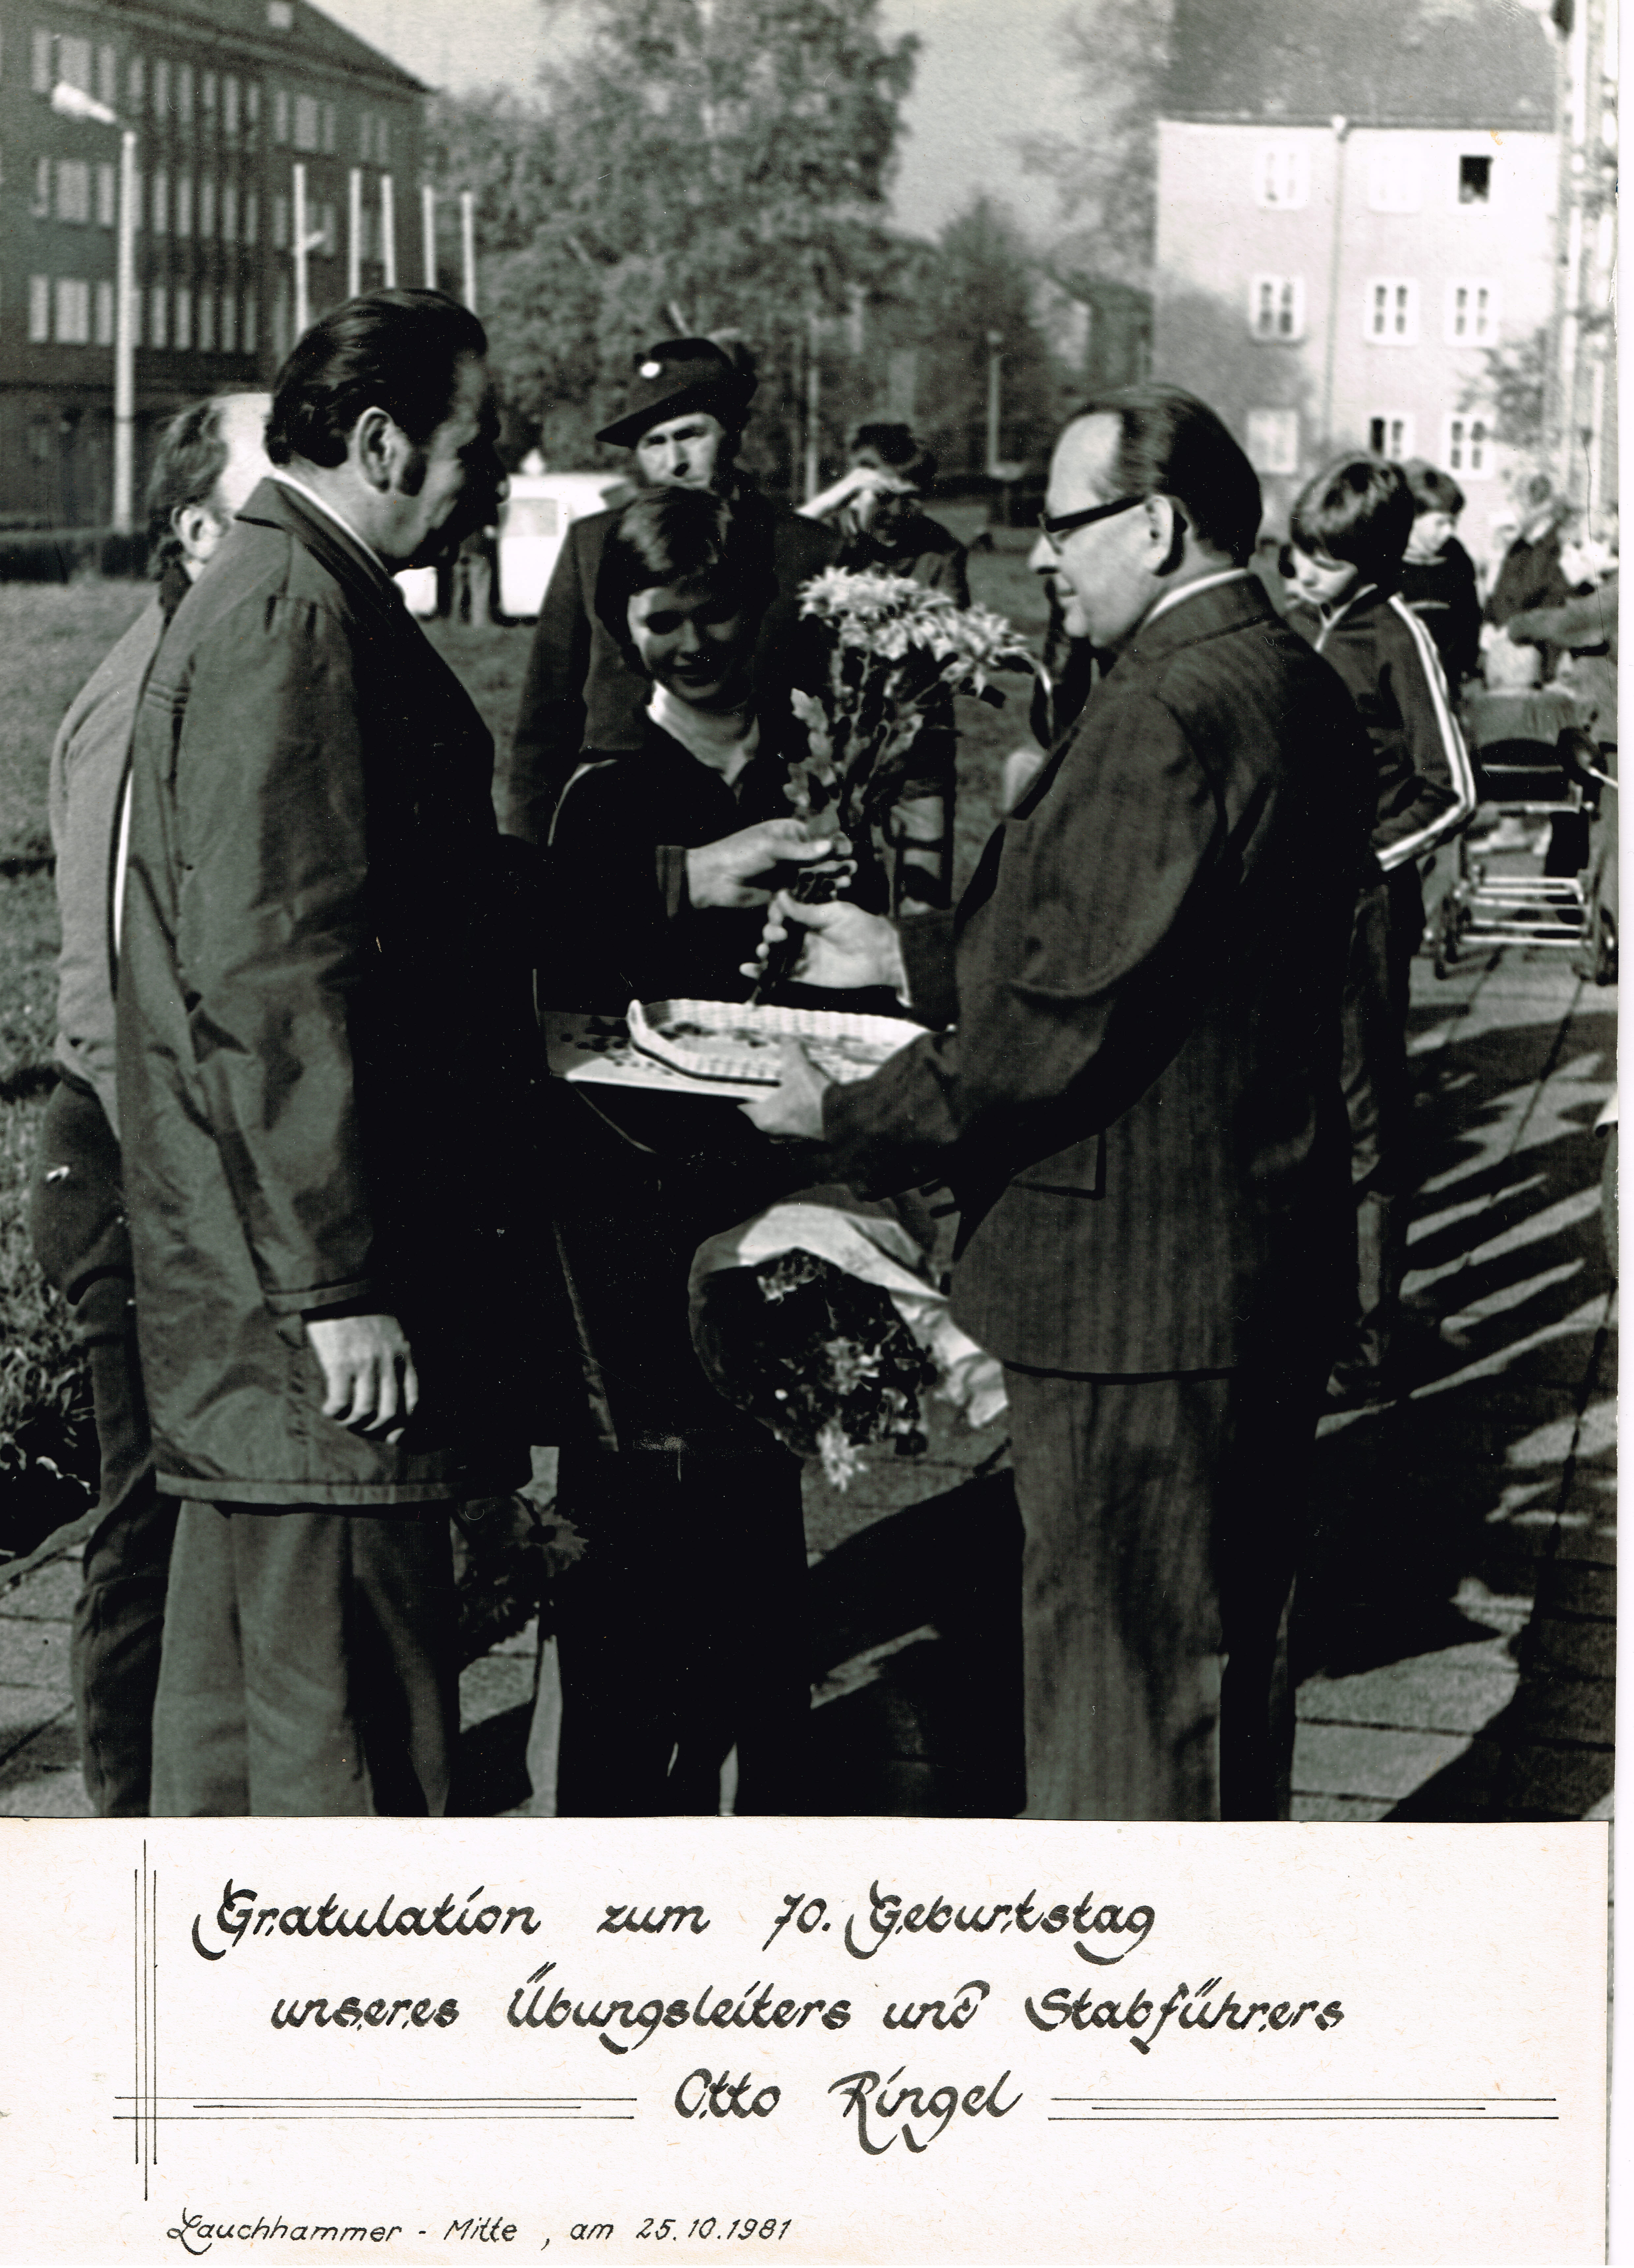 1981 Otto Ringel 70. Geburtstag 1981